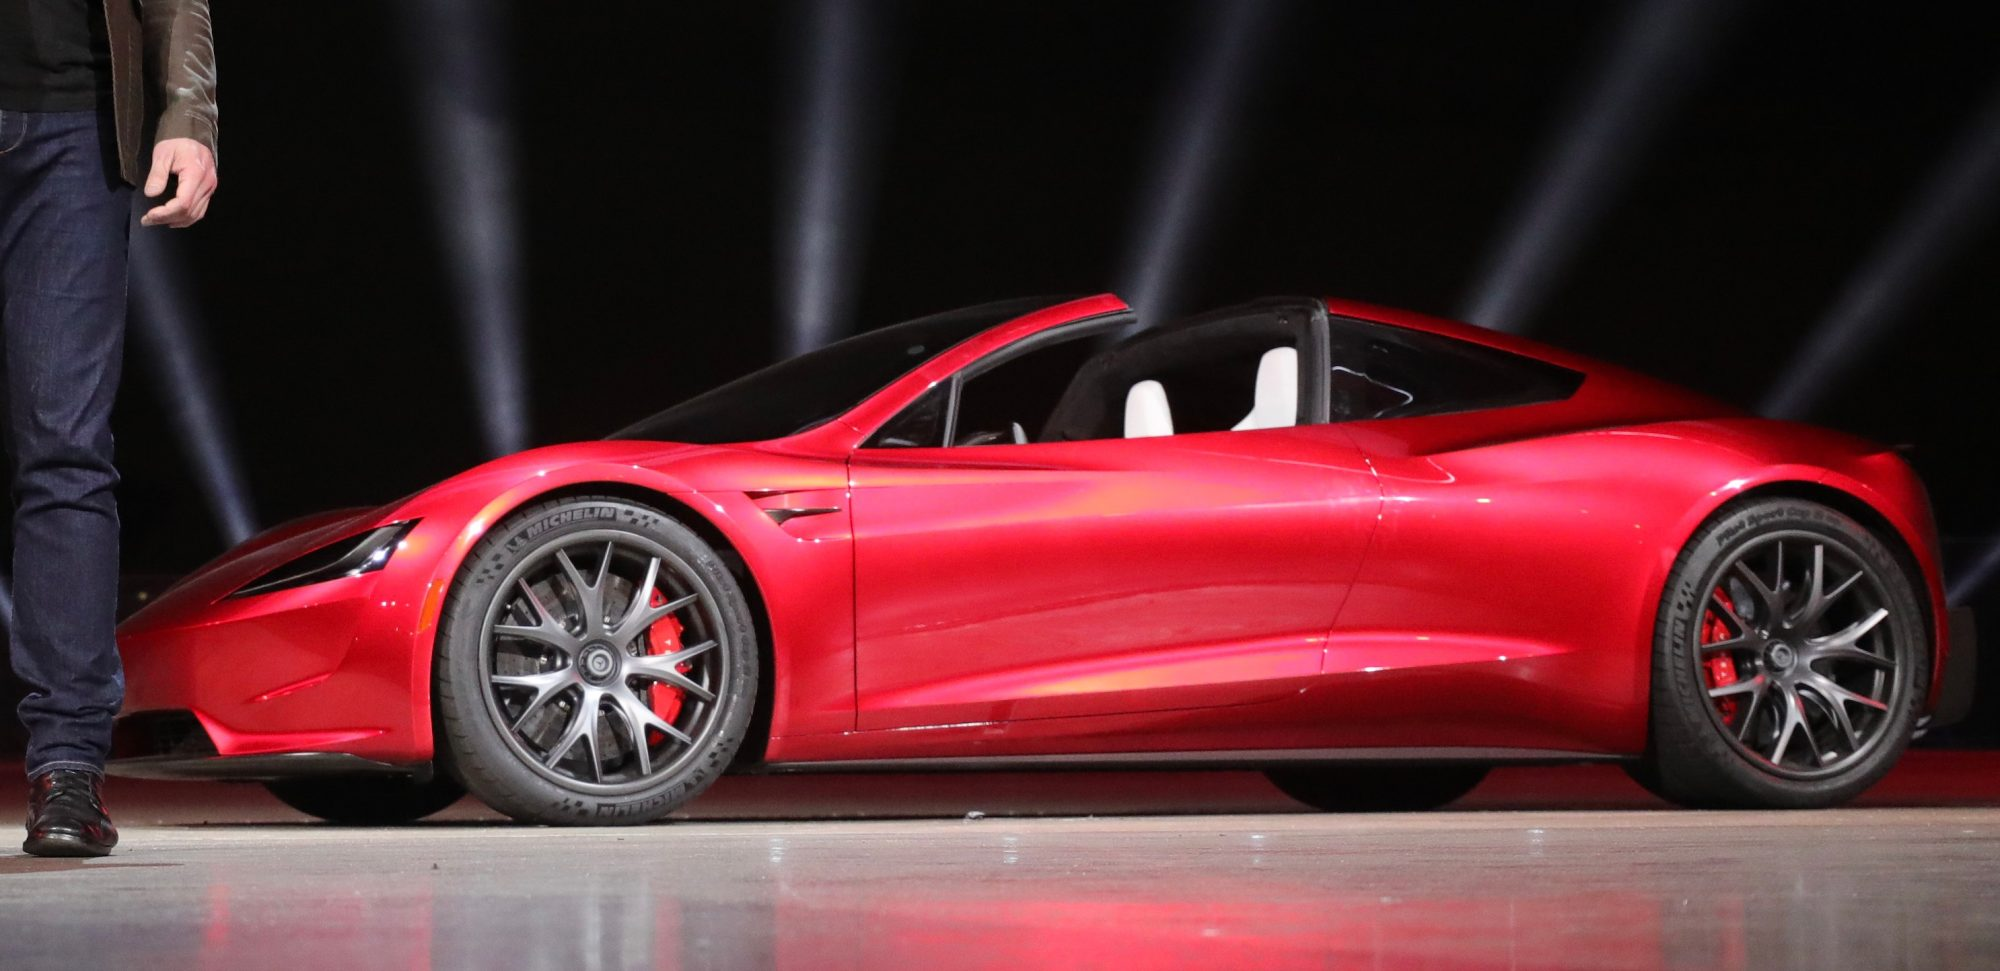 Tesla-Roadster-hero_large.jpg